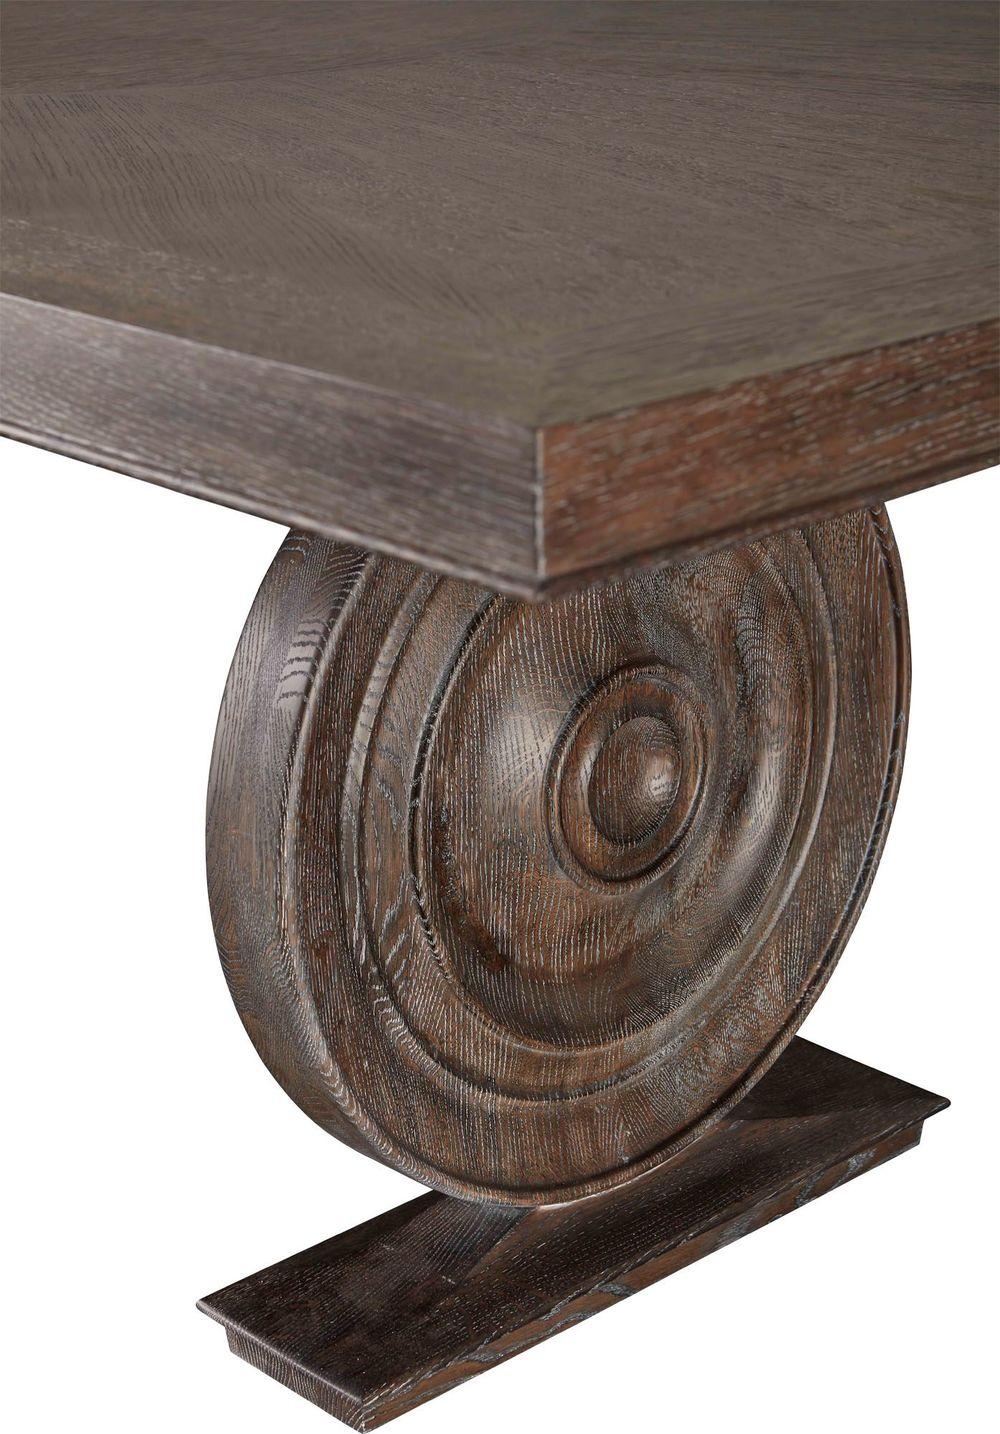 Baker Furniture - Hemingway Dining Table